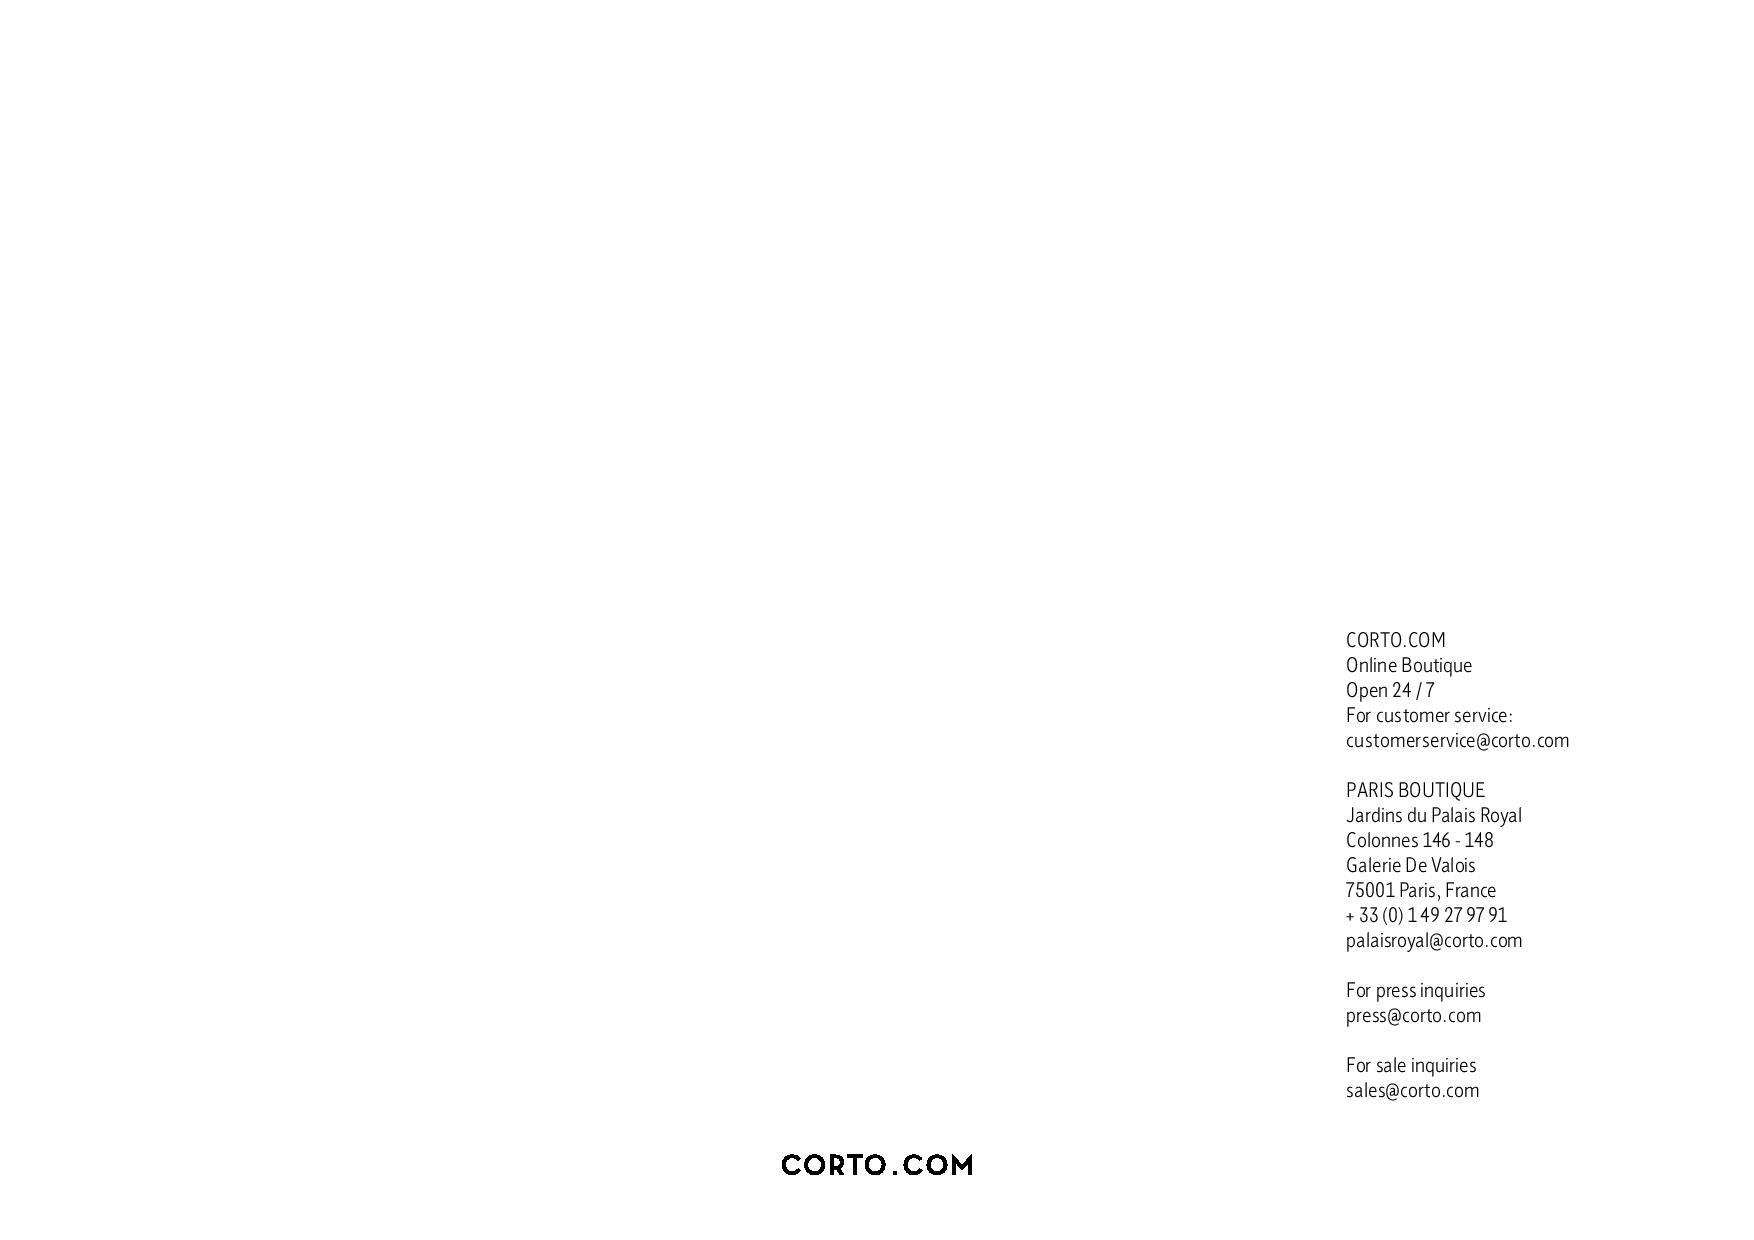 22_corto_moltedo_lookbook-page-022.jpg